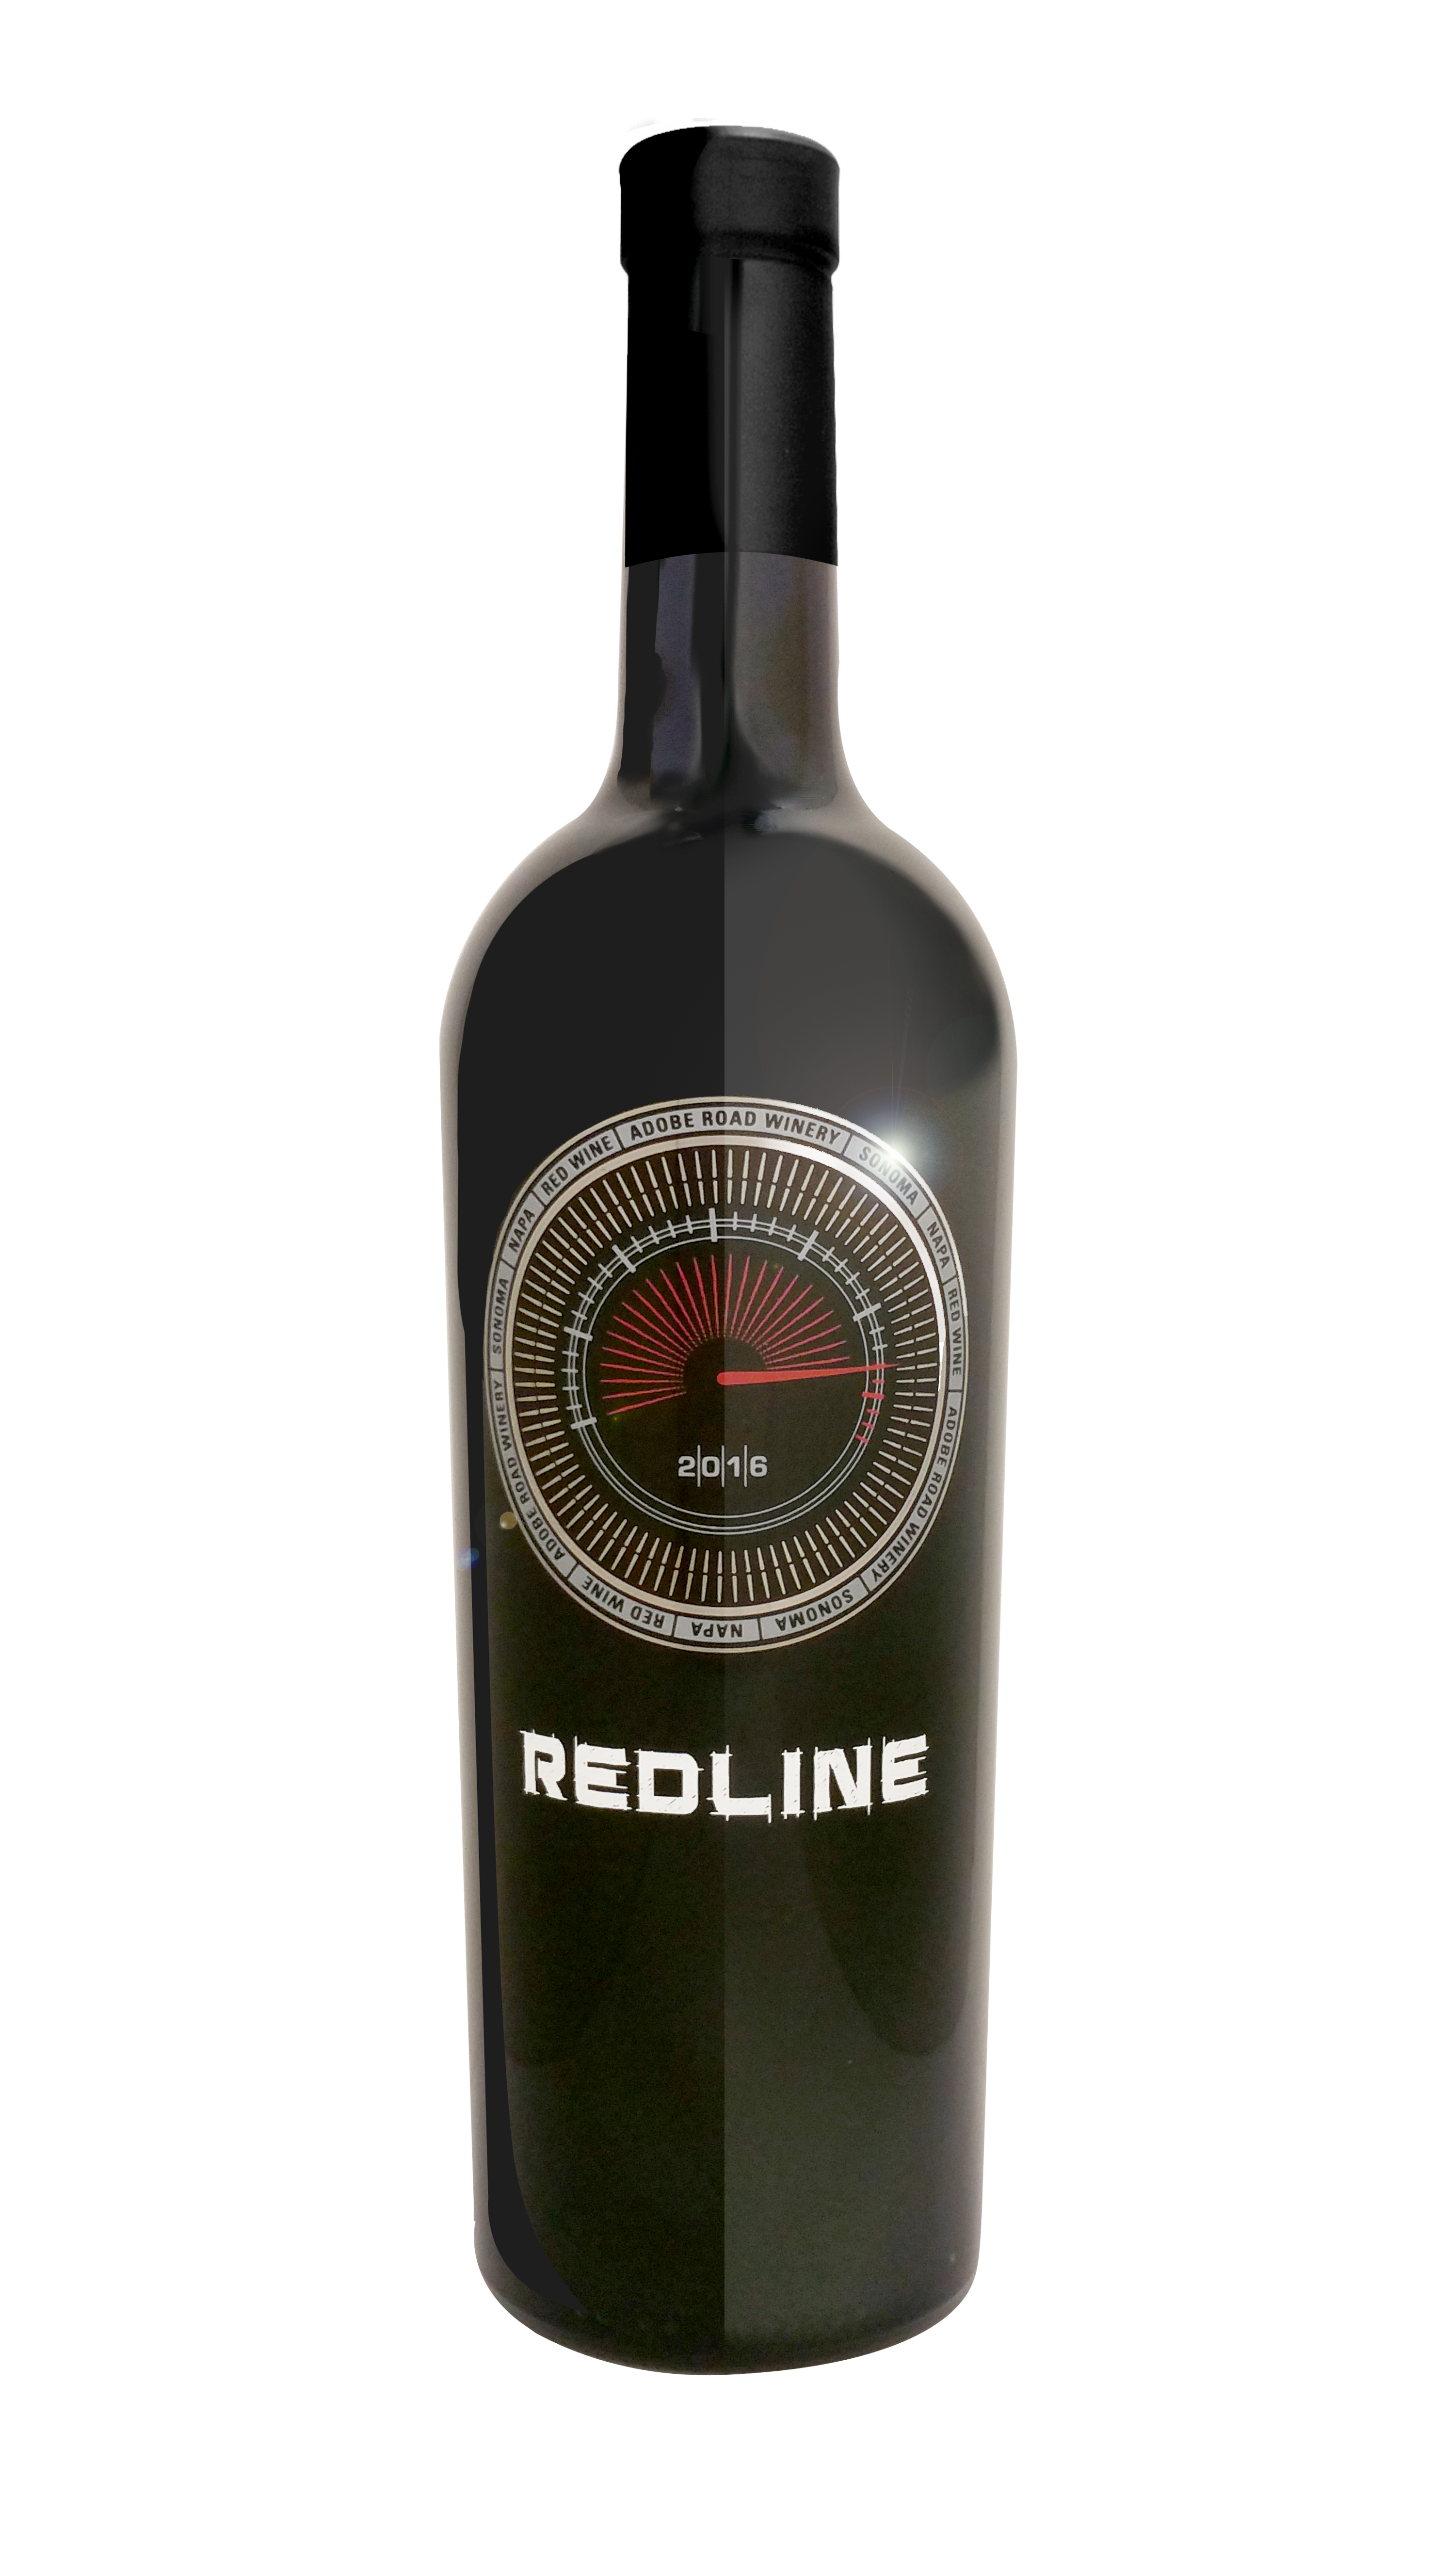 redline_12 bottleshot